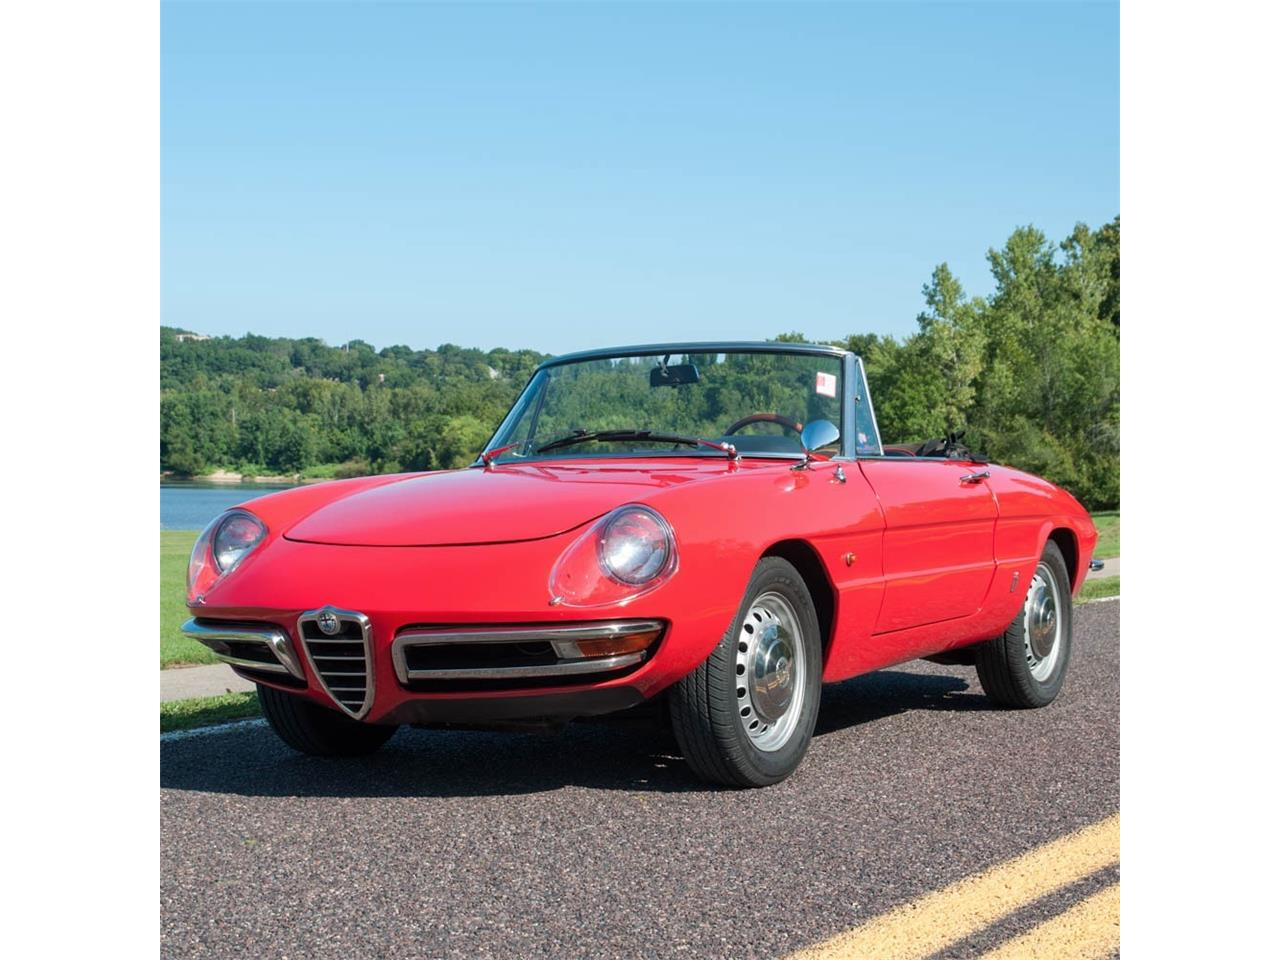 Alfa Romeo Duetto For Sale ClassicCarscom CC - 1967 alfa romeo spider for sale